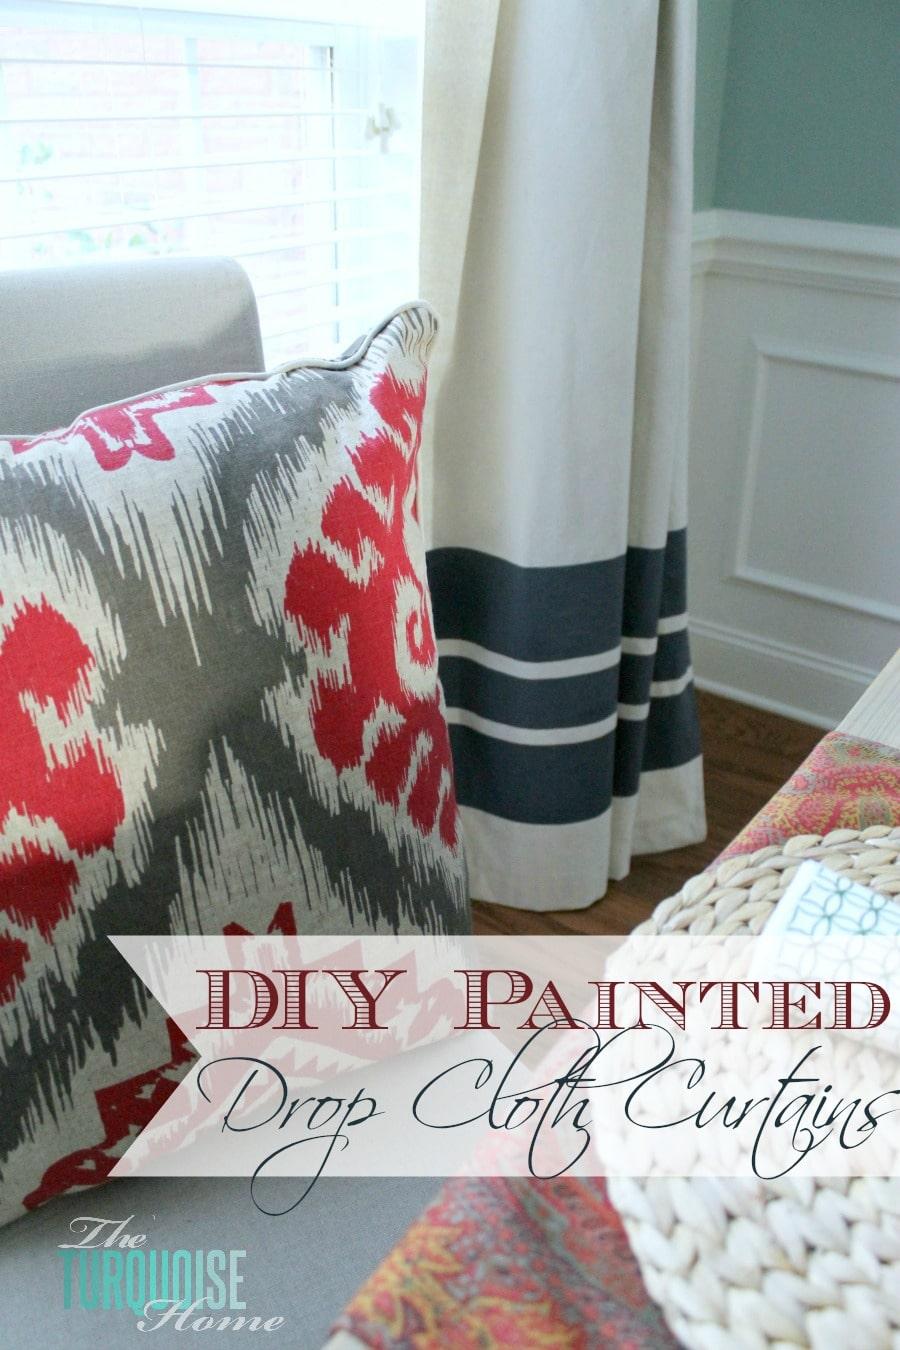 Drop cloth curtains dyed - Drop Cloth Curtains Dyed 46